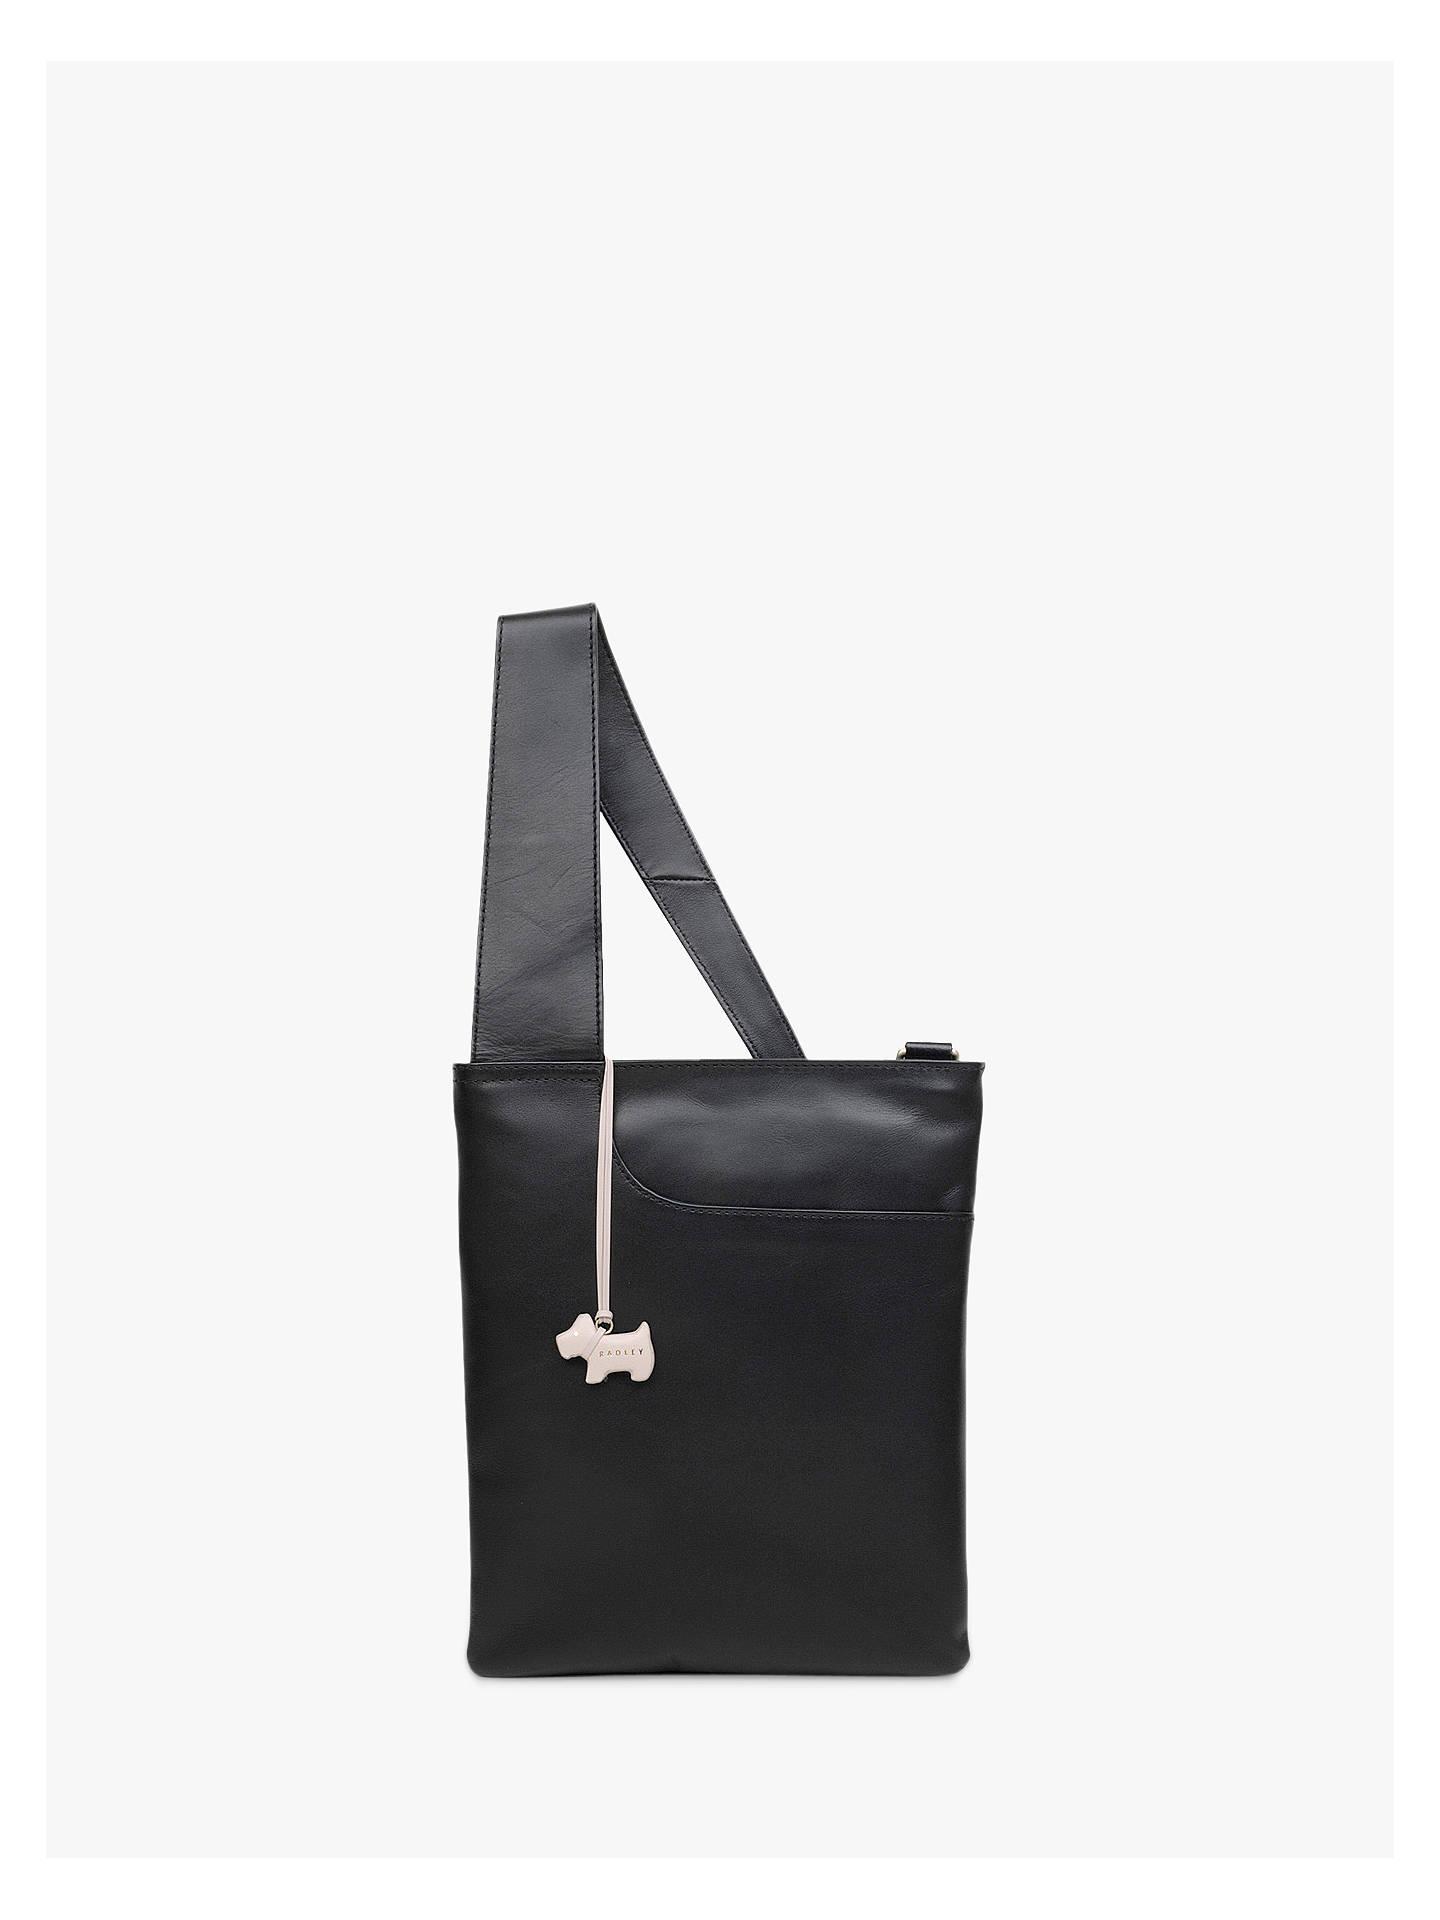 836eb9575dc6 Buy Radley Pockets Leather Medium Zip Top Cross Body Bag, Black Online at  johnlewis.